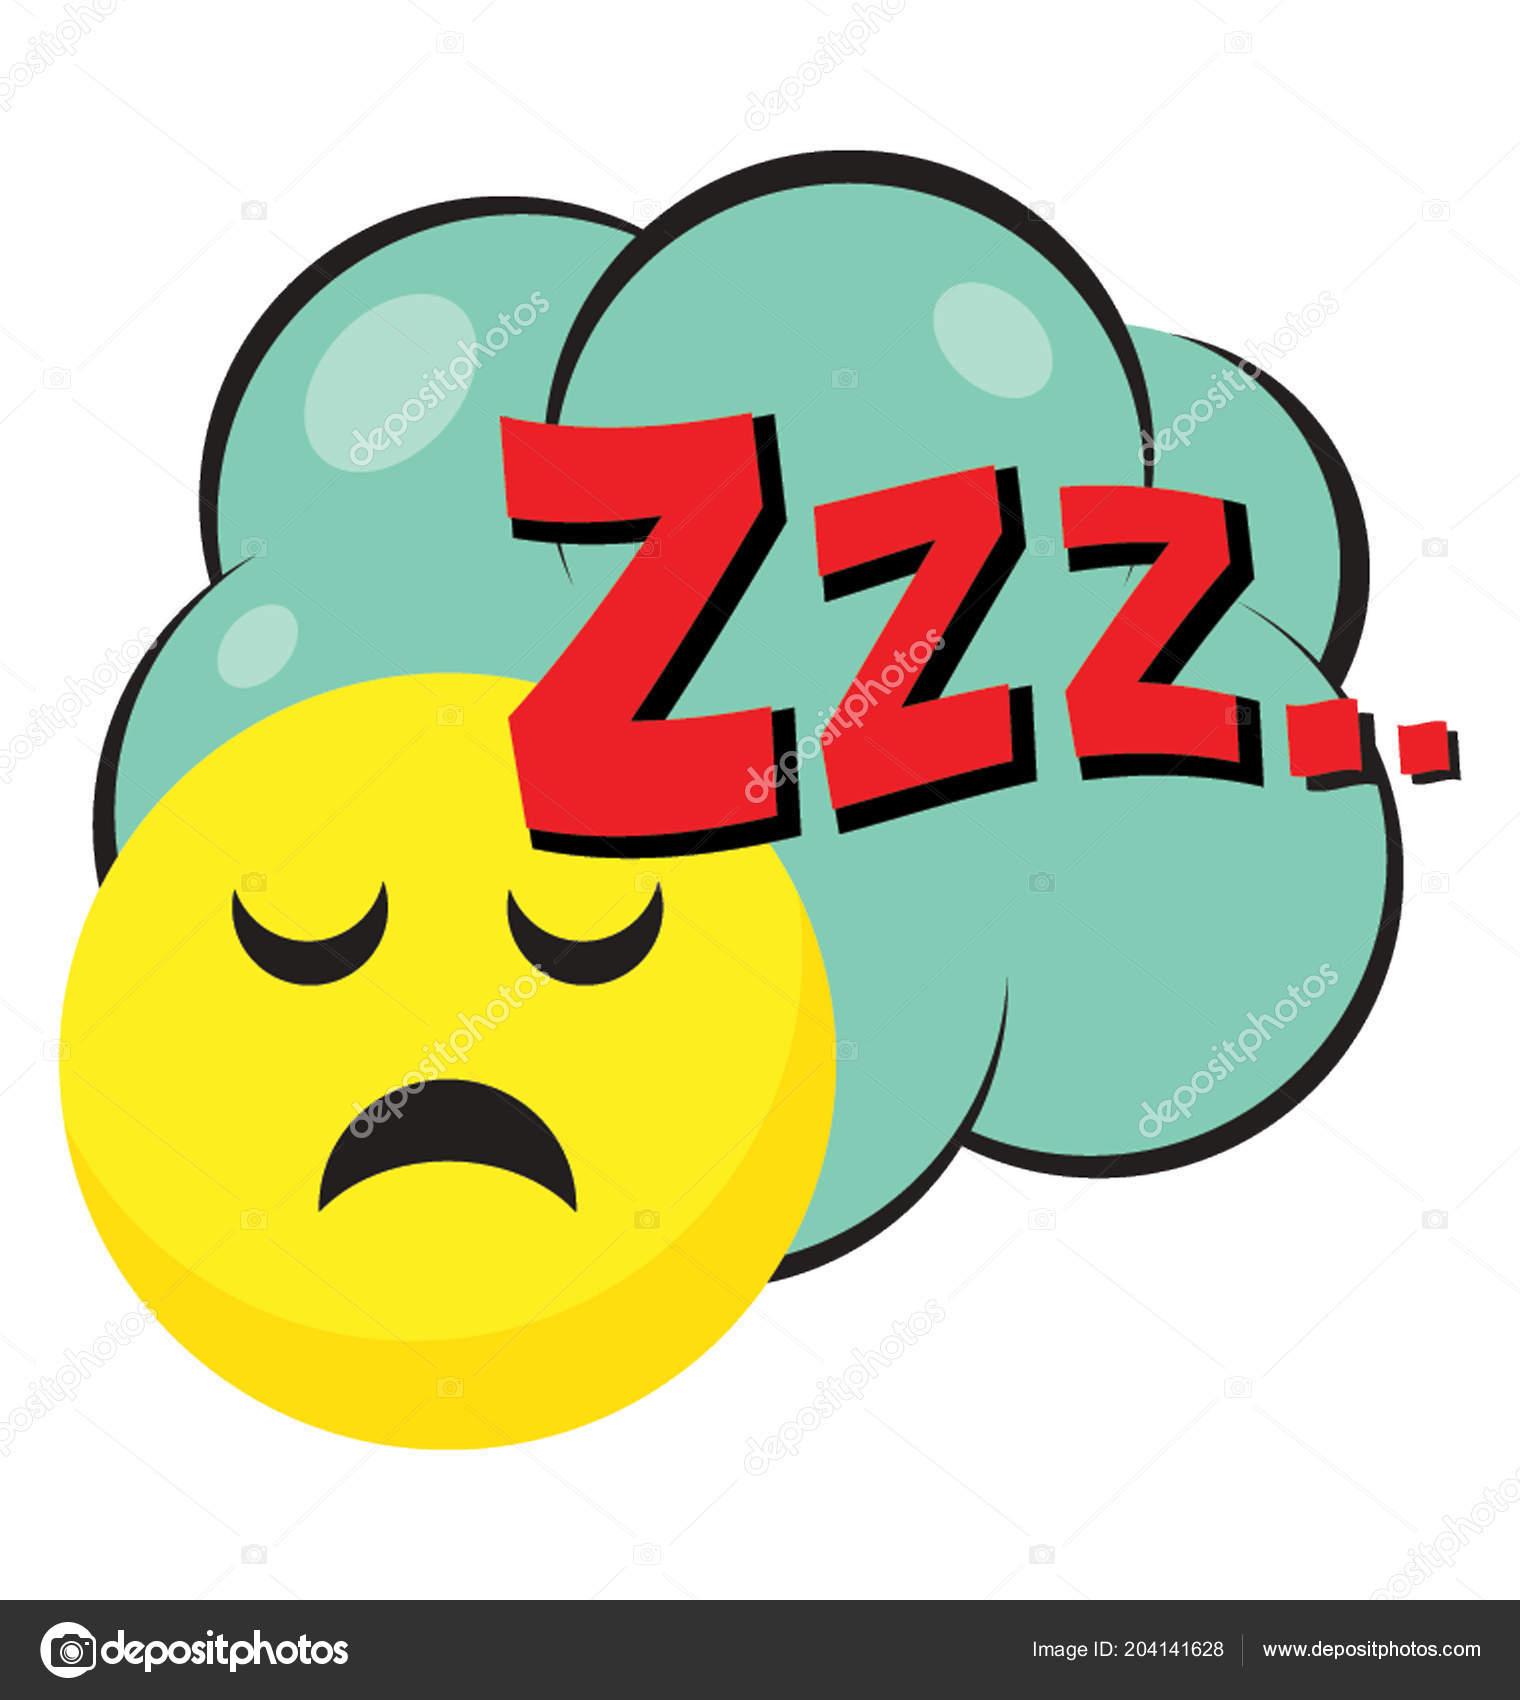 Images Snoring Symbol Zzz Symbol Snoring Sleep Funny Pop Art Bubble Stock Vector C Prosymbols 204141628